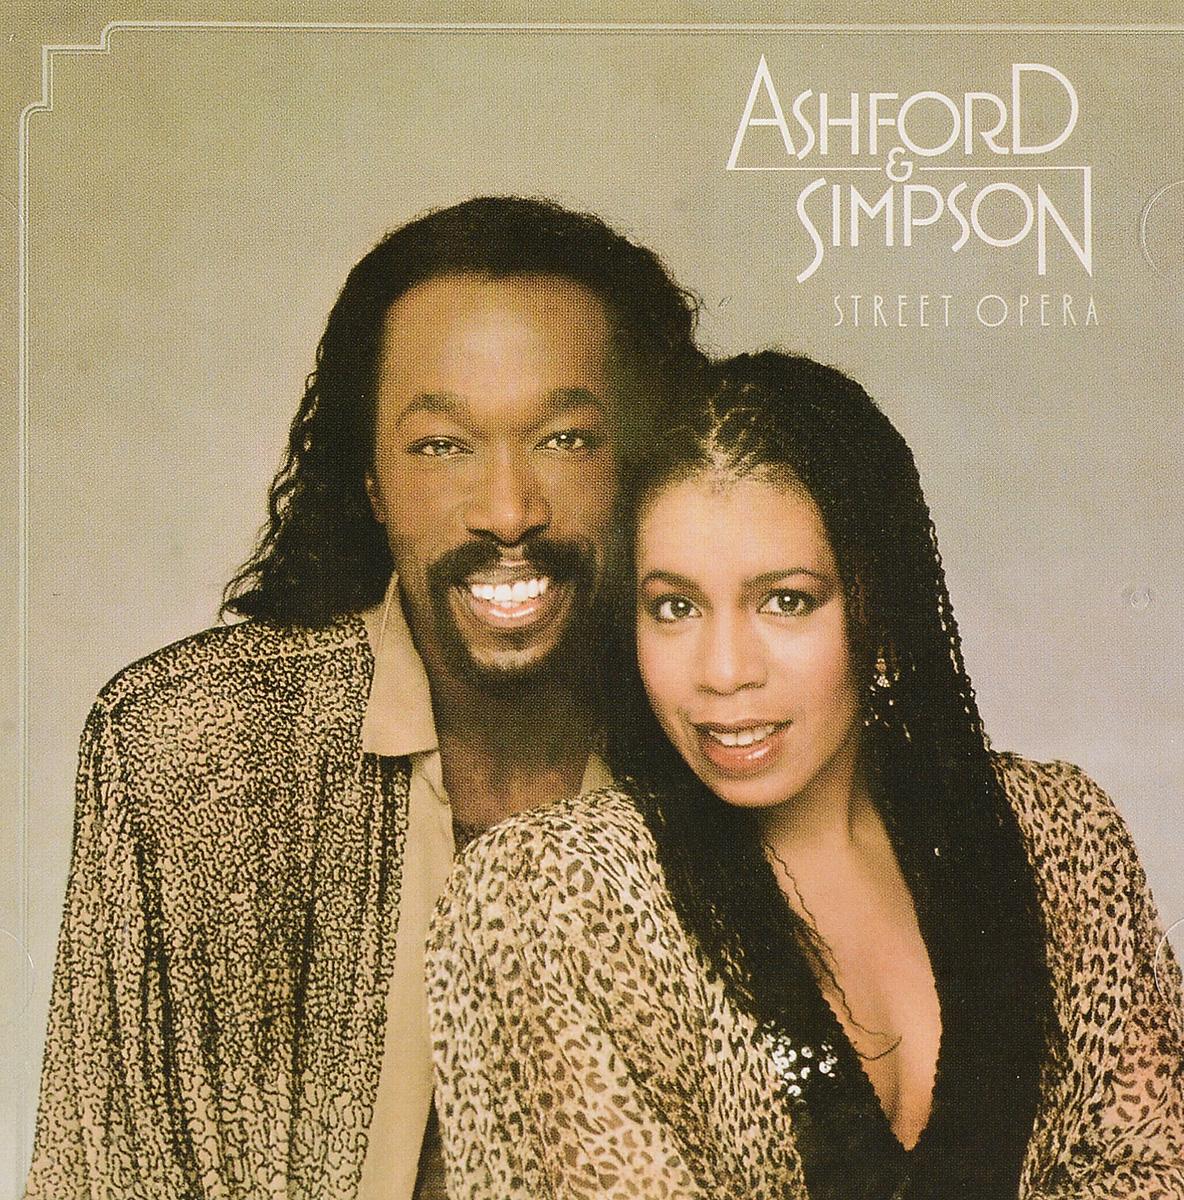 Ashford & Simpson. Street Opera